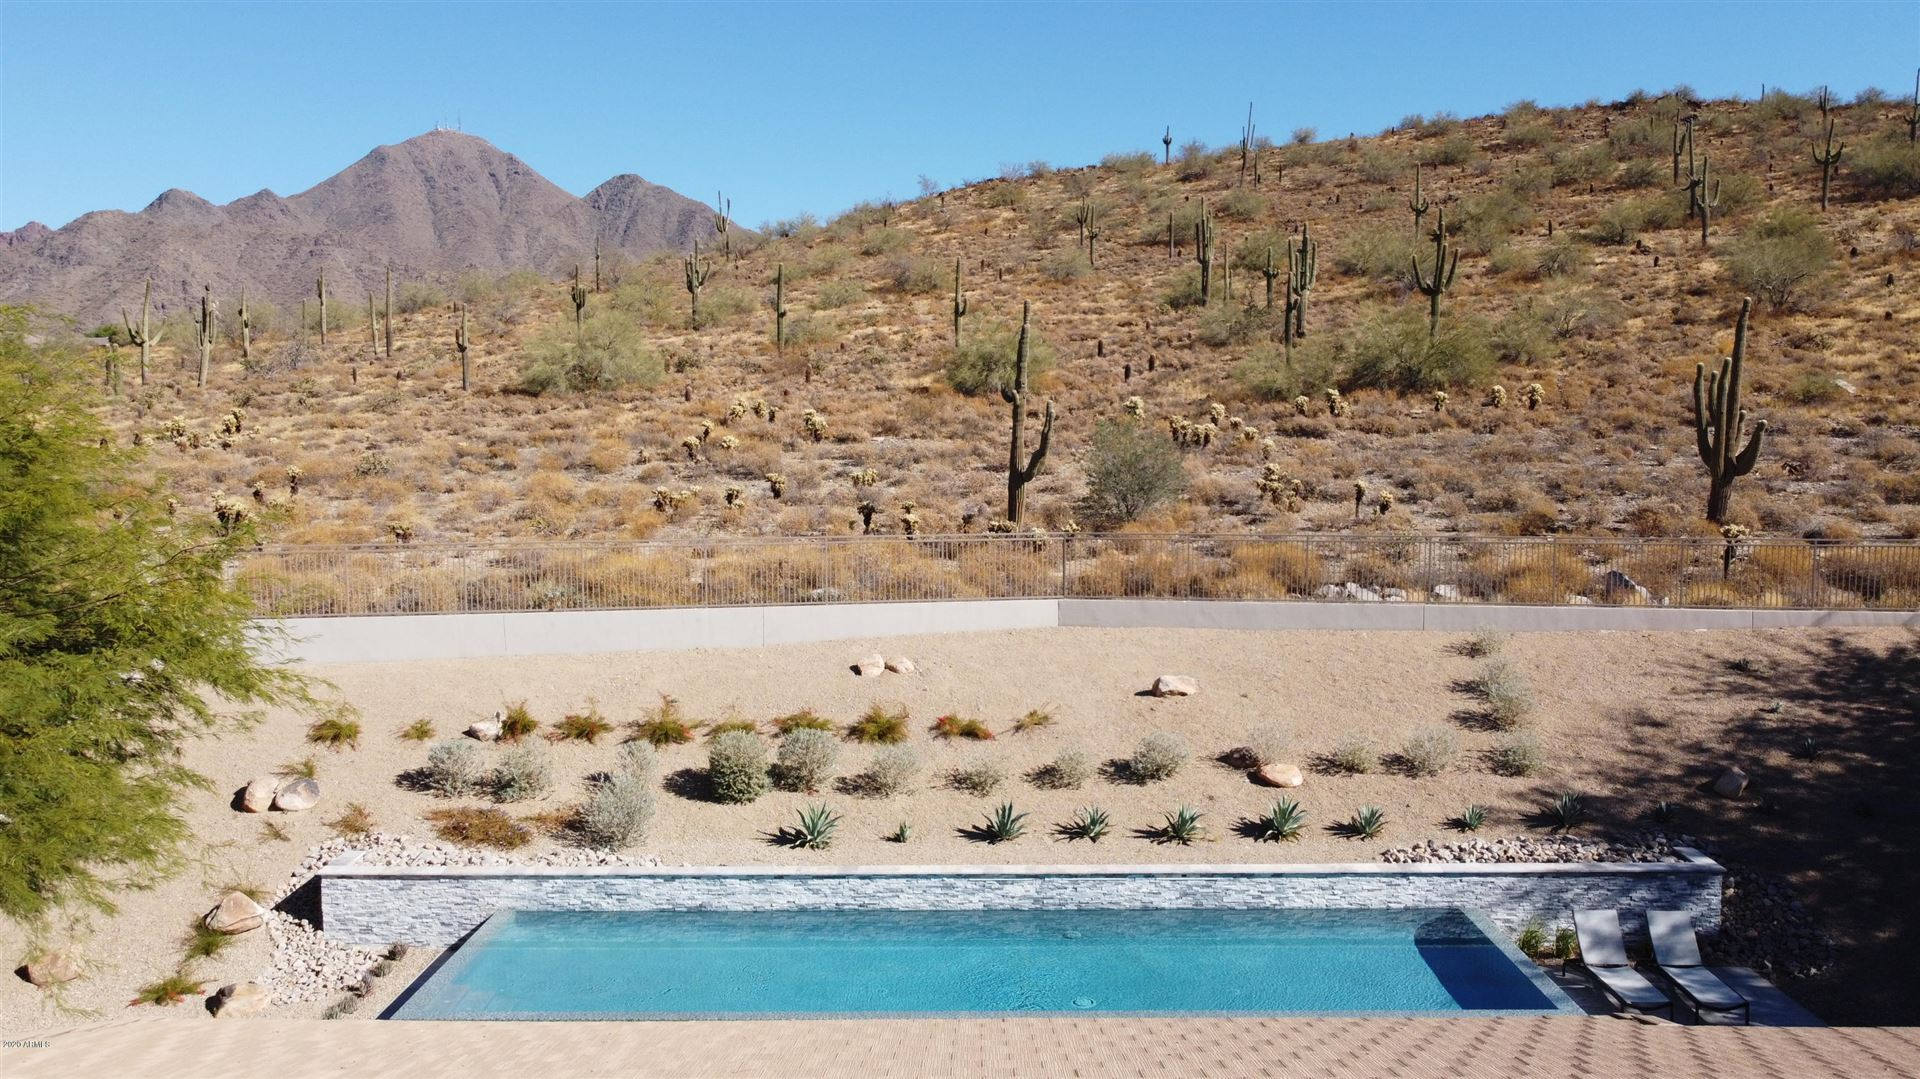 Photo of 14863 N 110TH Way, Scottsdale, AZ 85255 (MLS # 6165350)